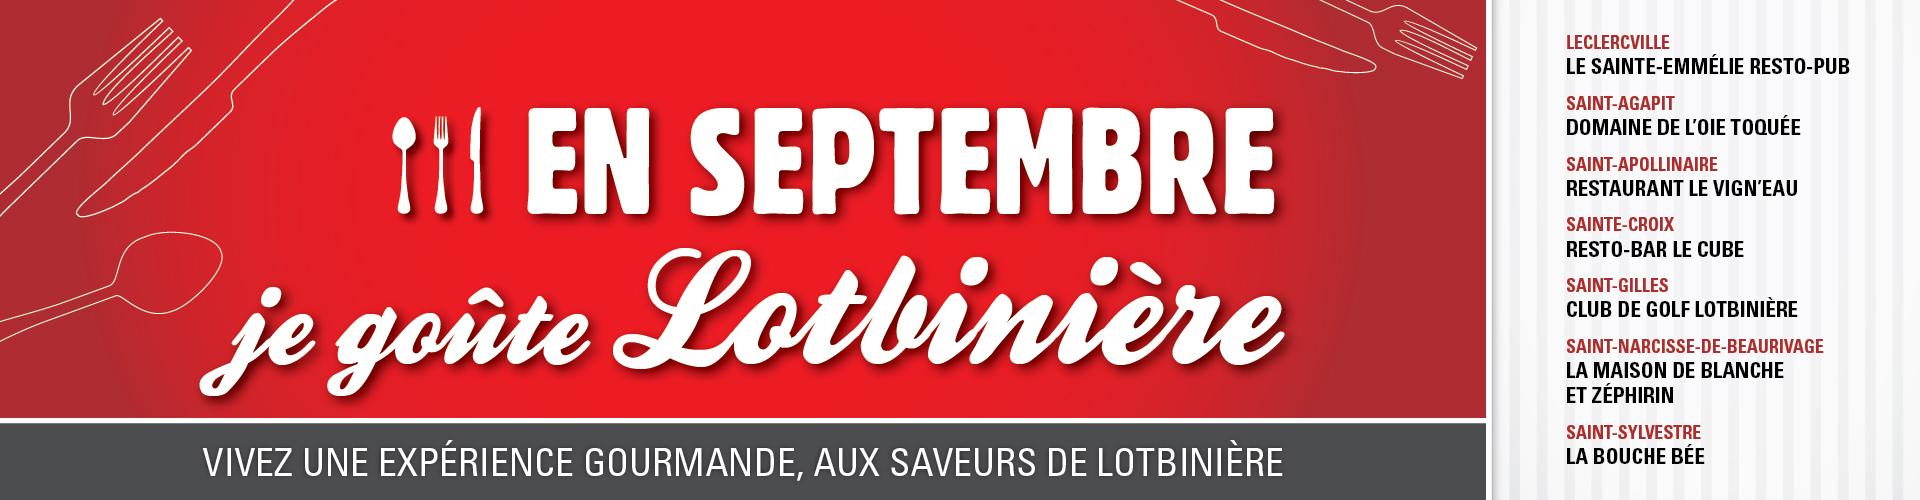 Slider_Septembre-je-goute-Lotbiniere_72dpi-1